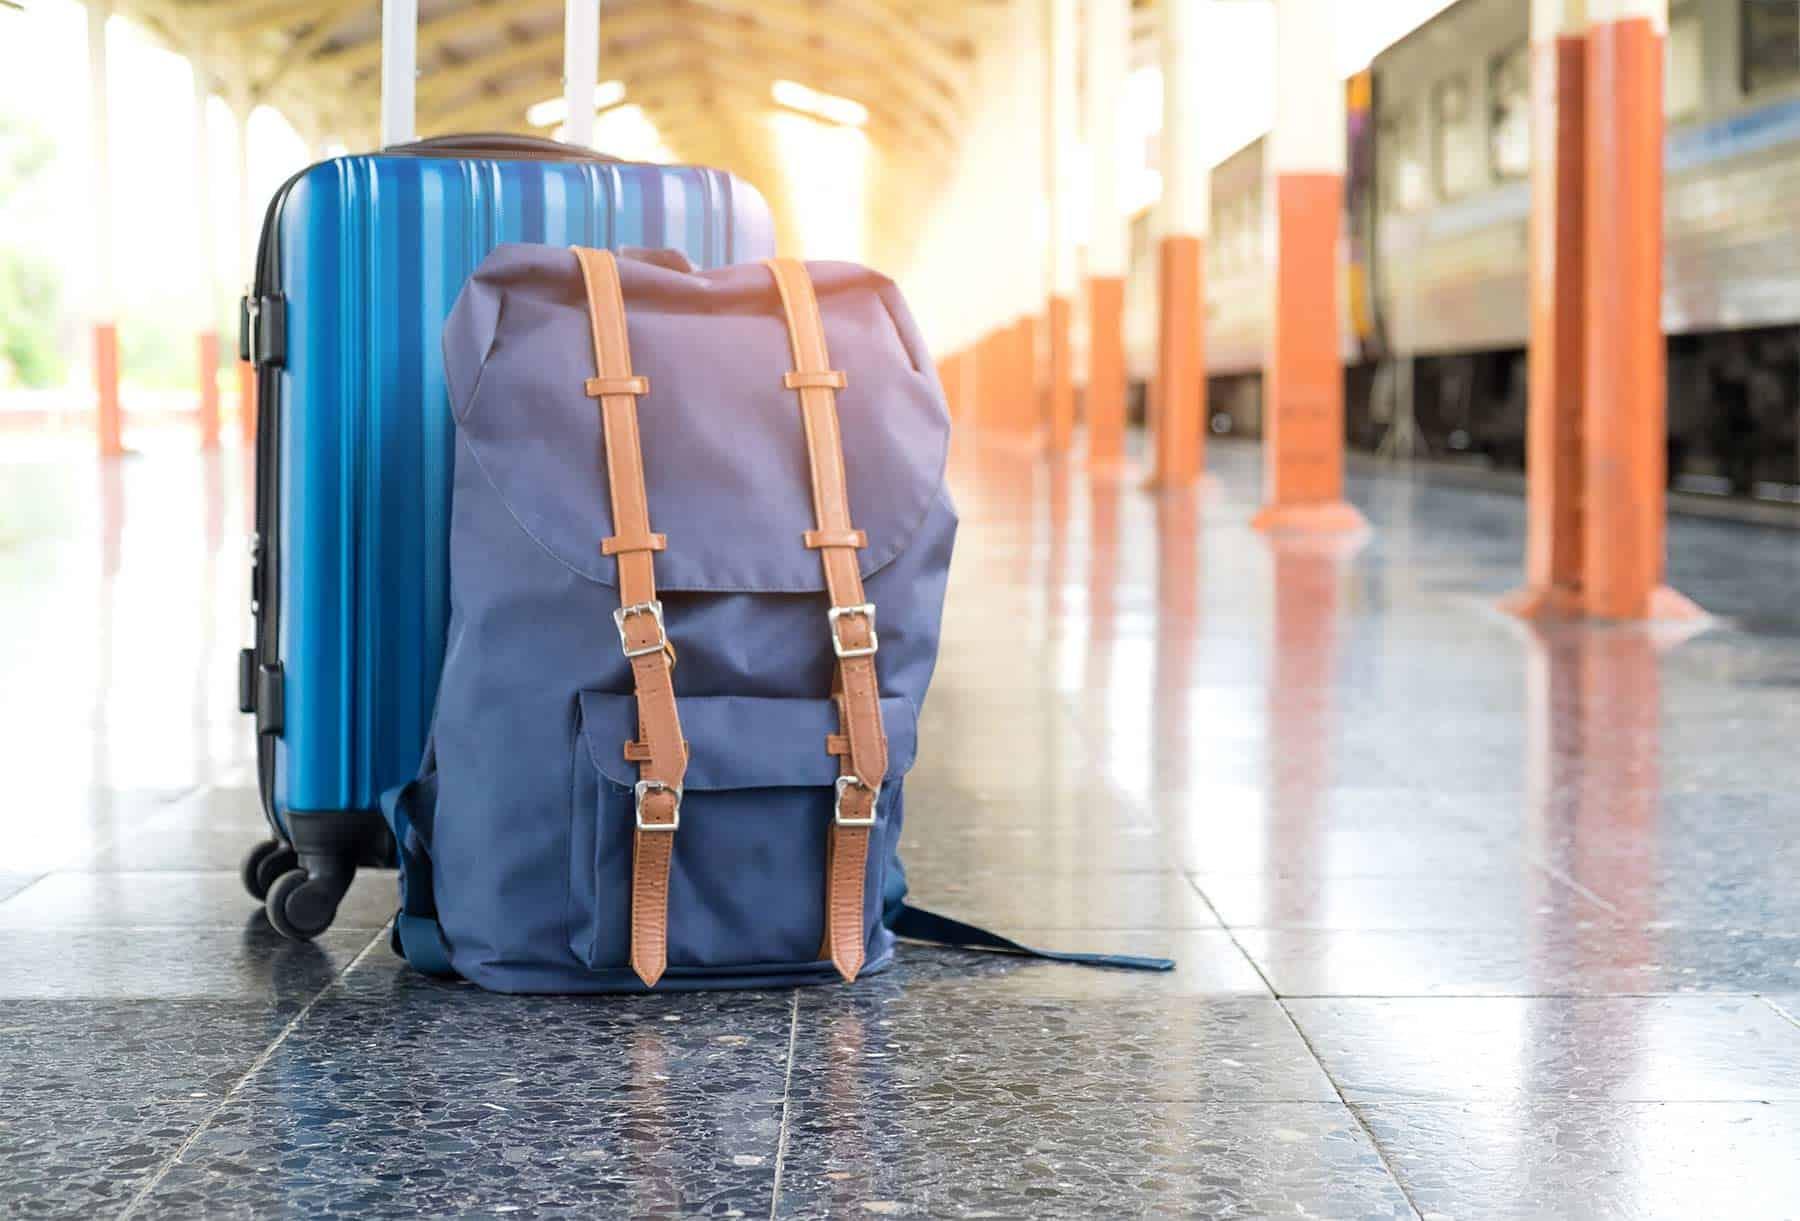 Travel luggage on the platform